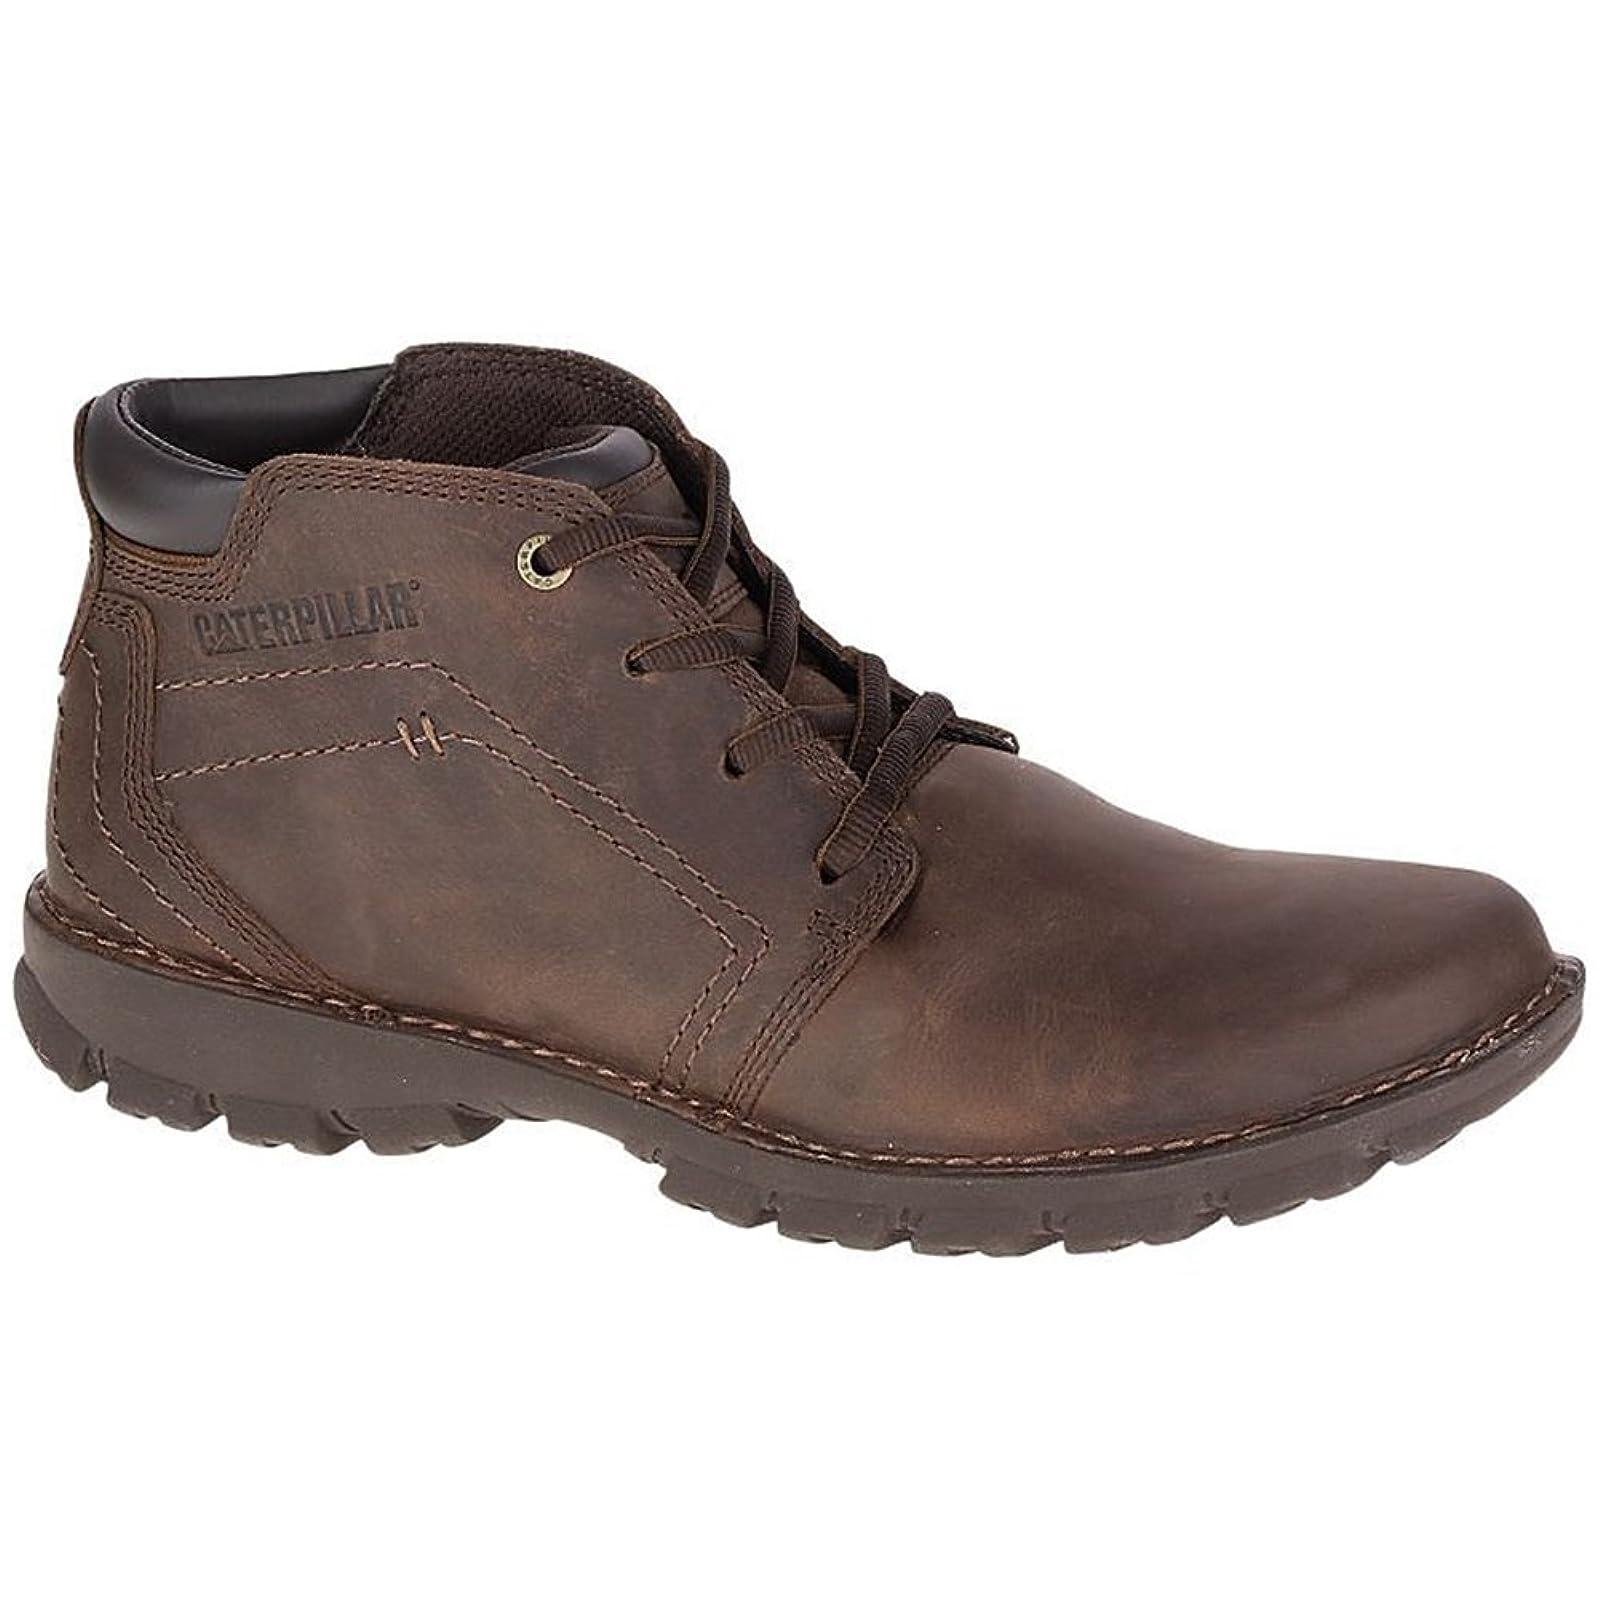 Caterpillar Men's Transform 2.0 Ankle Boot 10 M US - 4